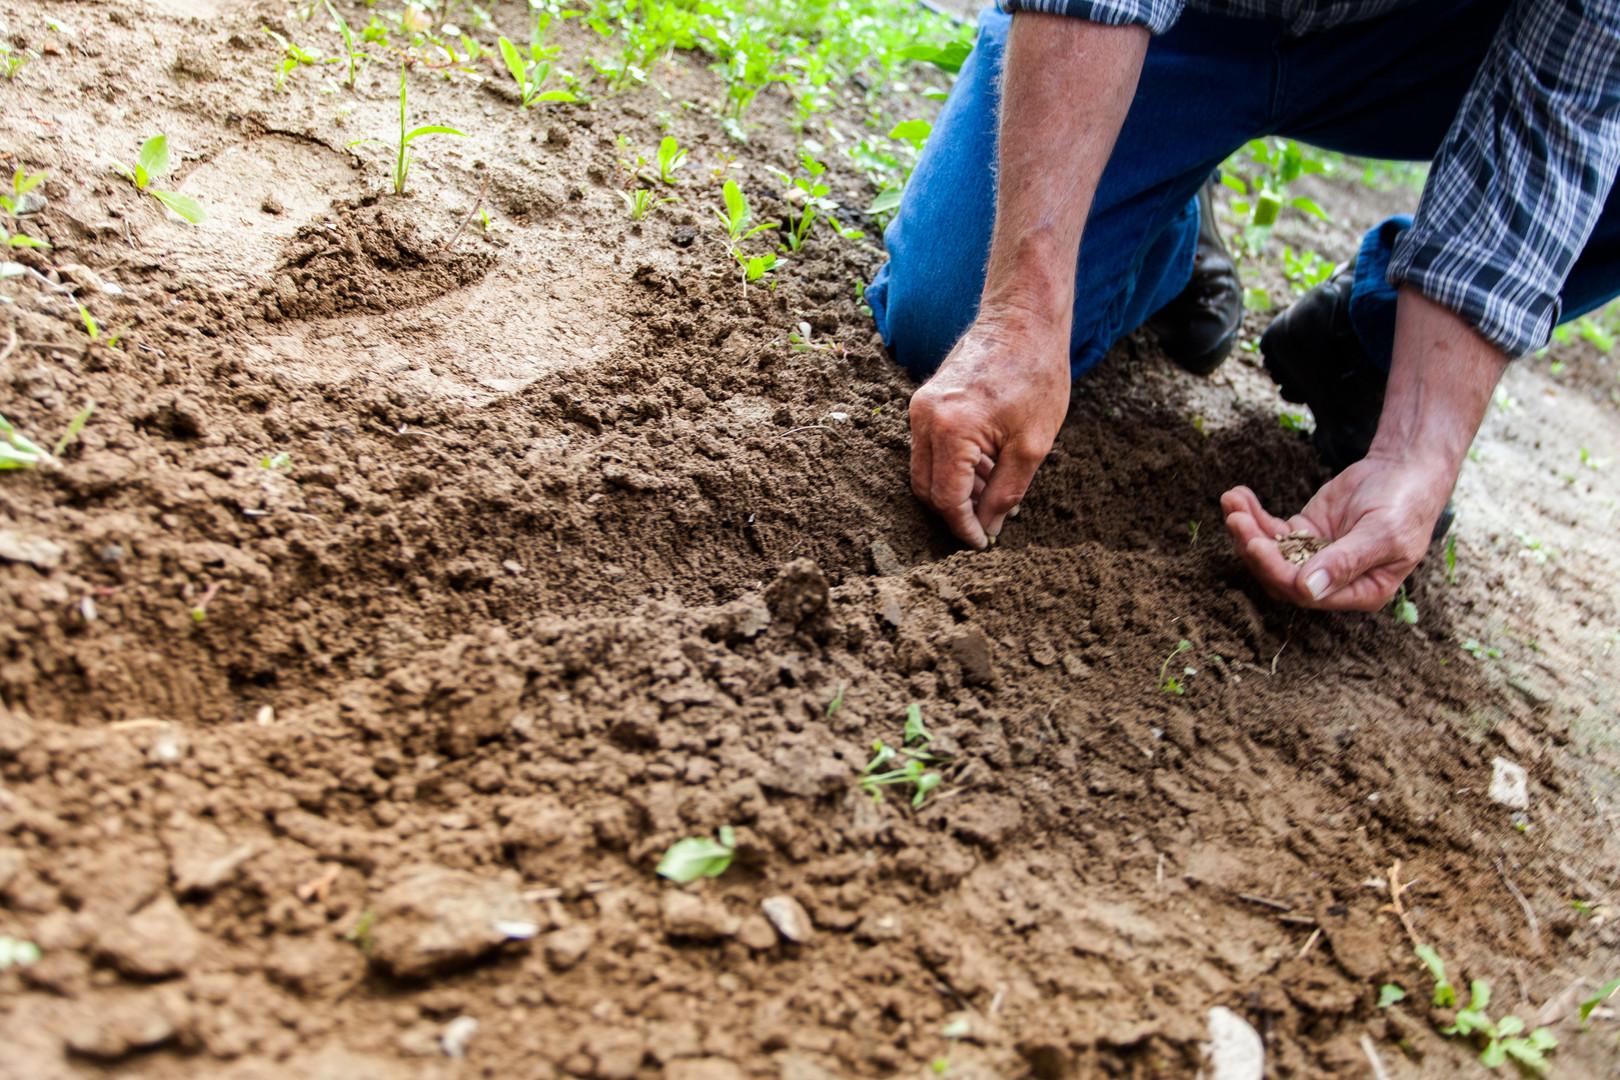 close-up-cultivation-dig-169523.jpg